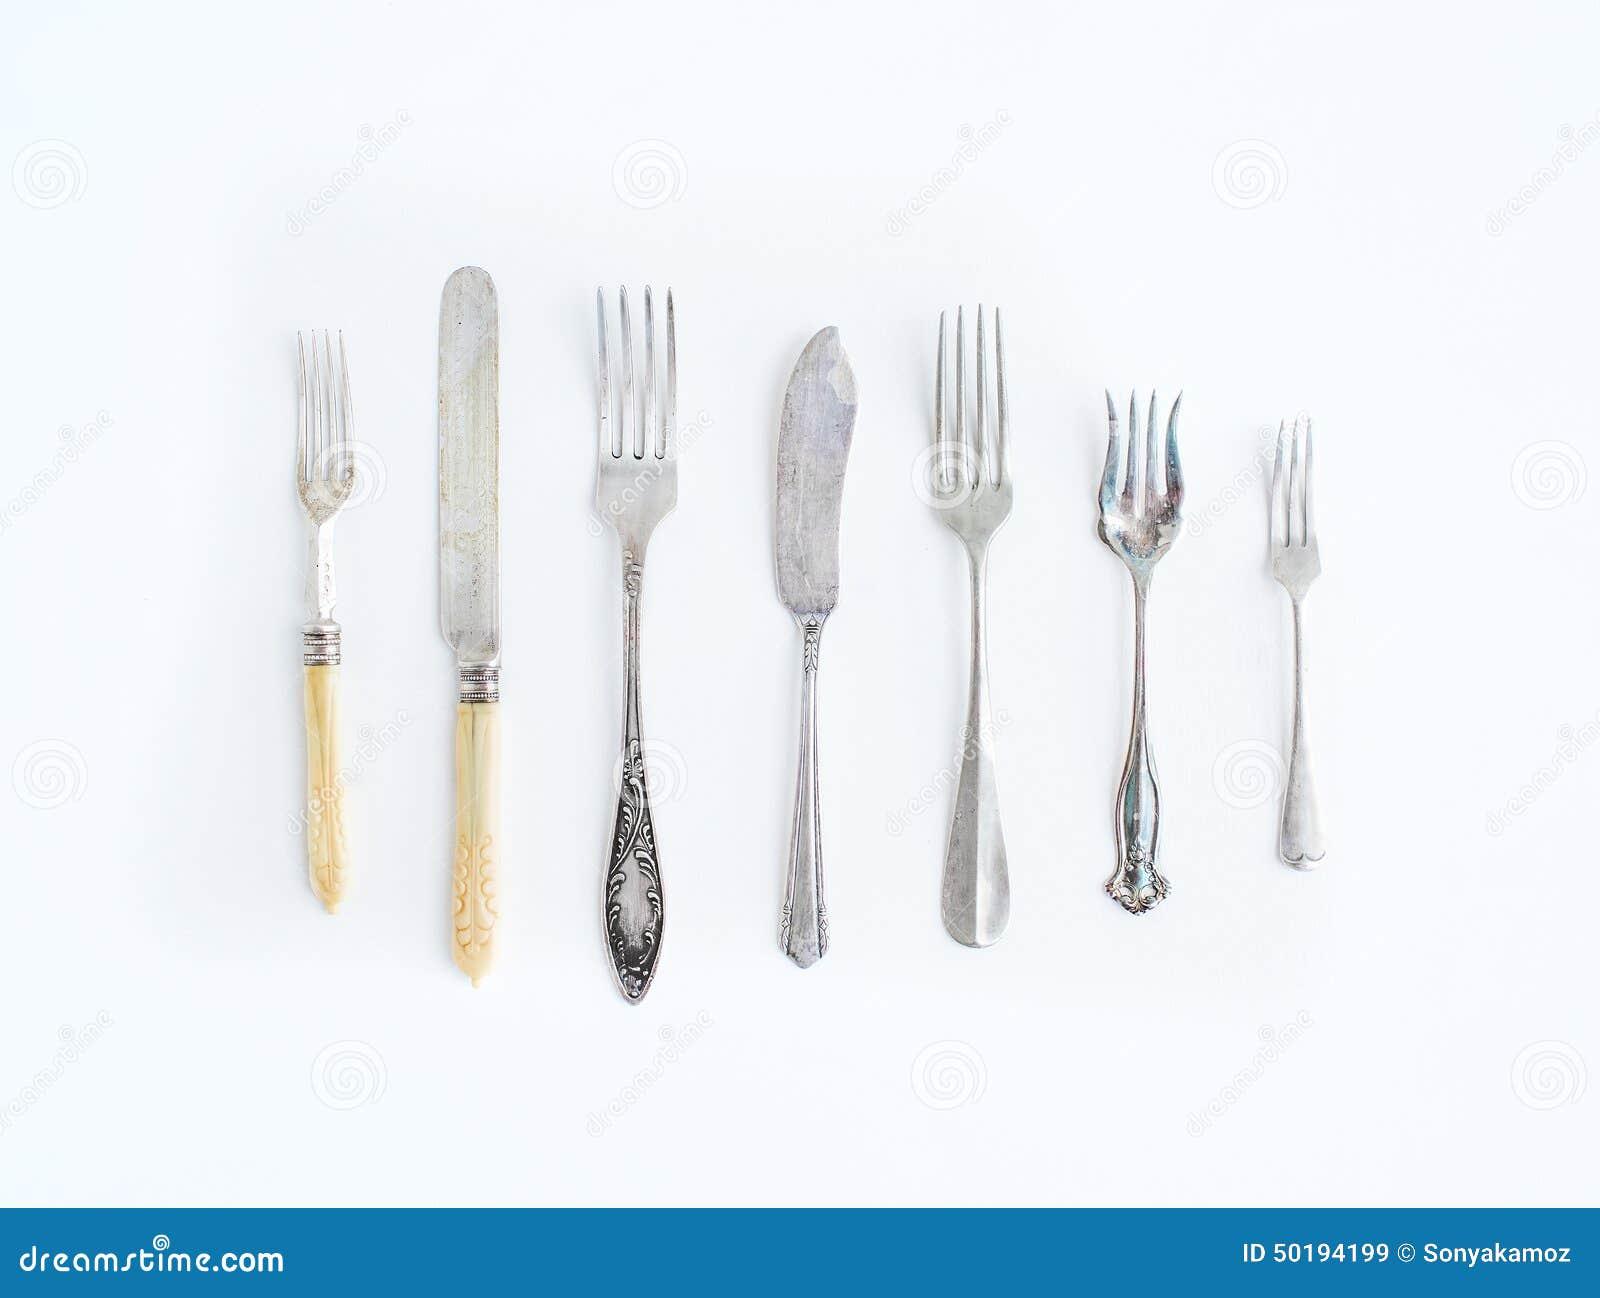 A Set Of Vintage Dining Knifes And Forks Of Different